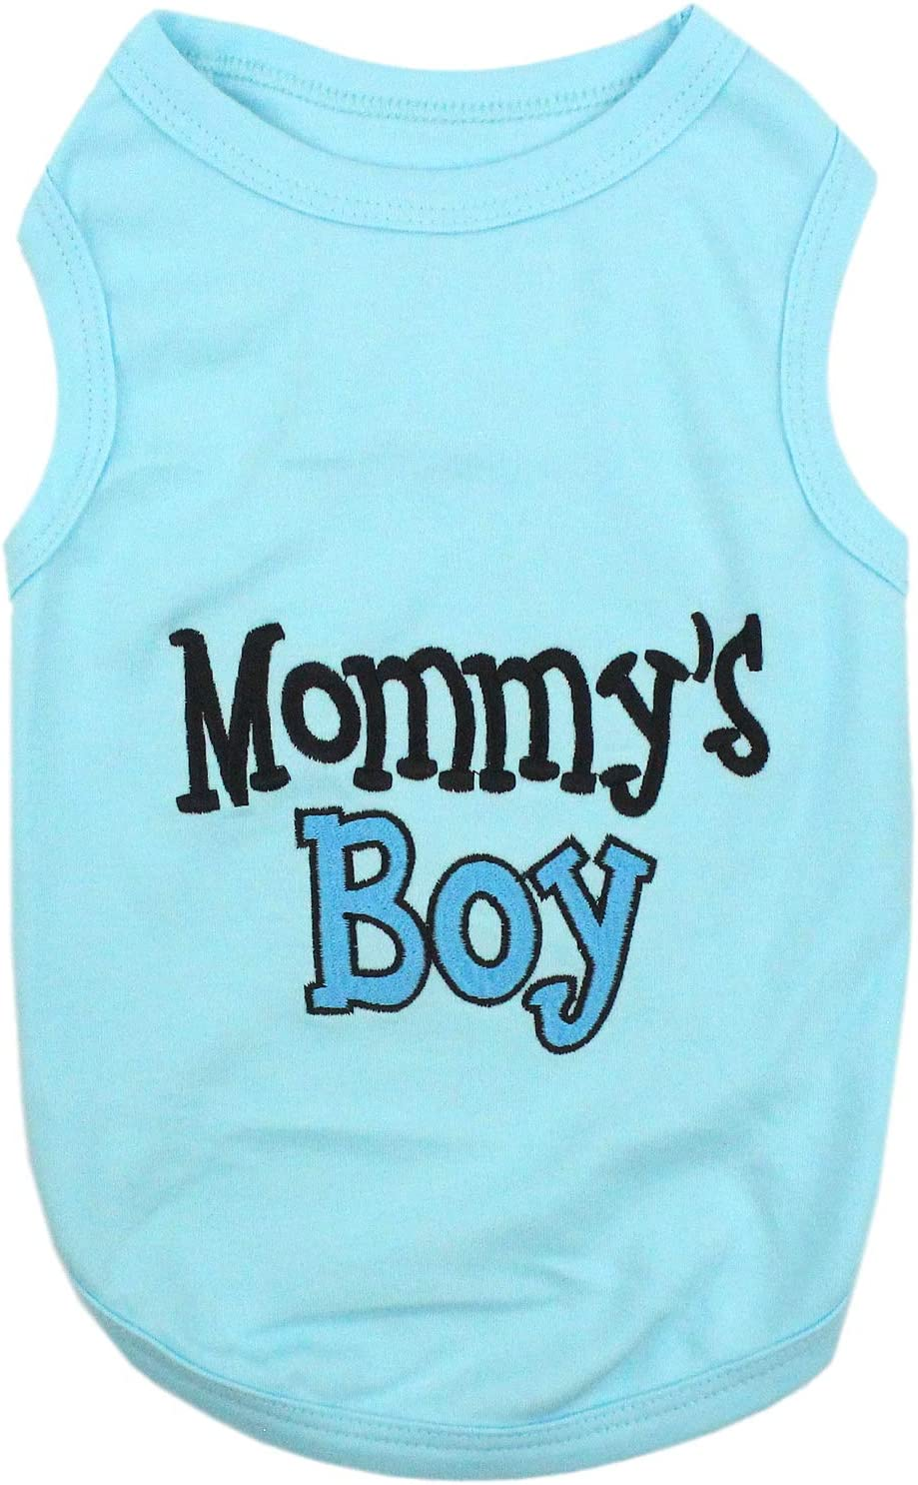 Xx-Small Parisian Pet Mommys Boy T-Shirt